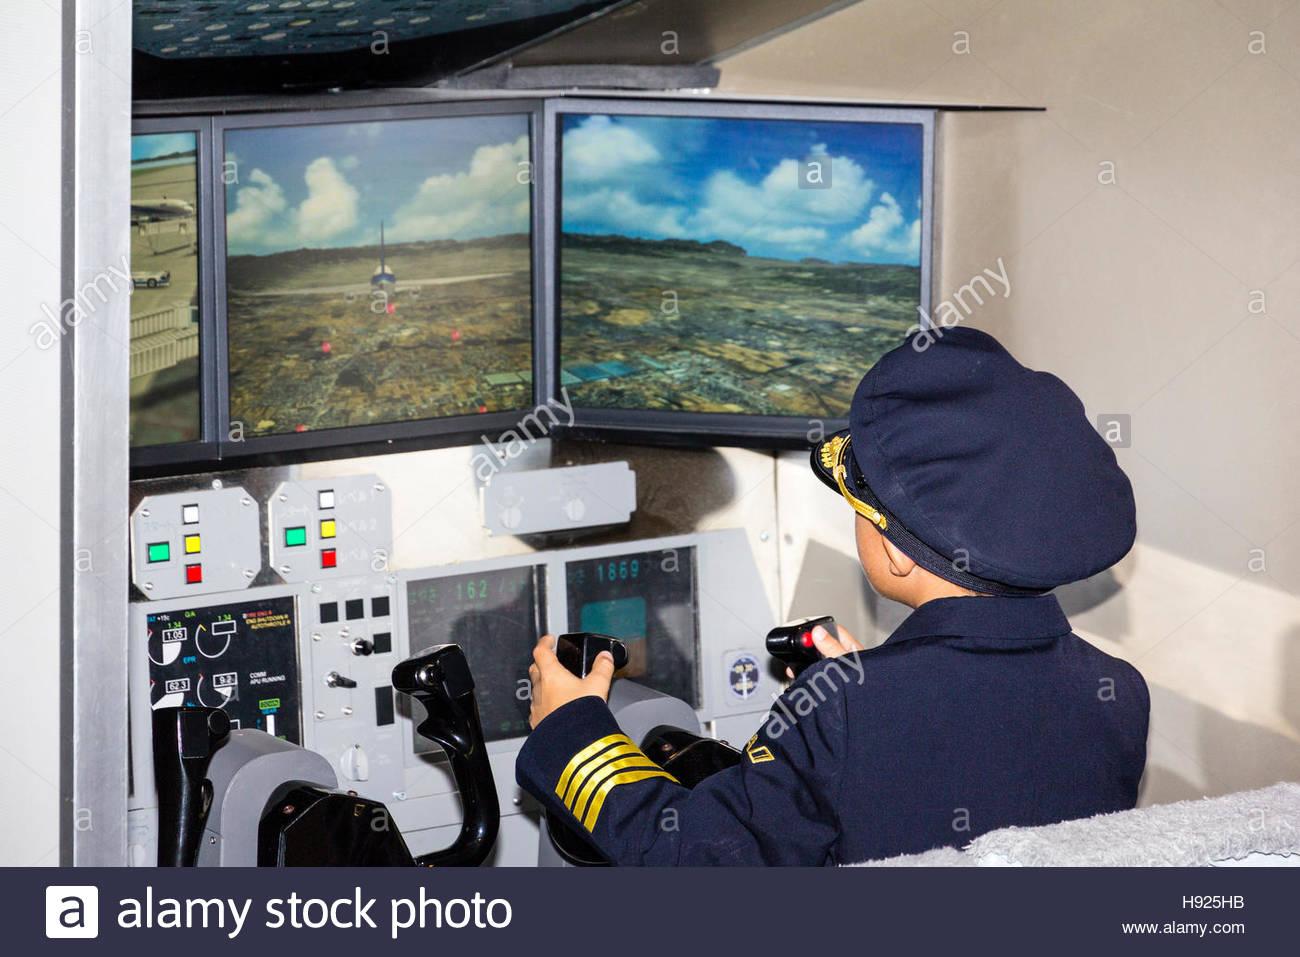 Click image for larger version.  Name:japan-nishinomiya-kidzania-ana-flight-simulators-with-boy-child-in-H925HB.jpg Views:33 Size:151.8 KB ID:25492